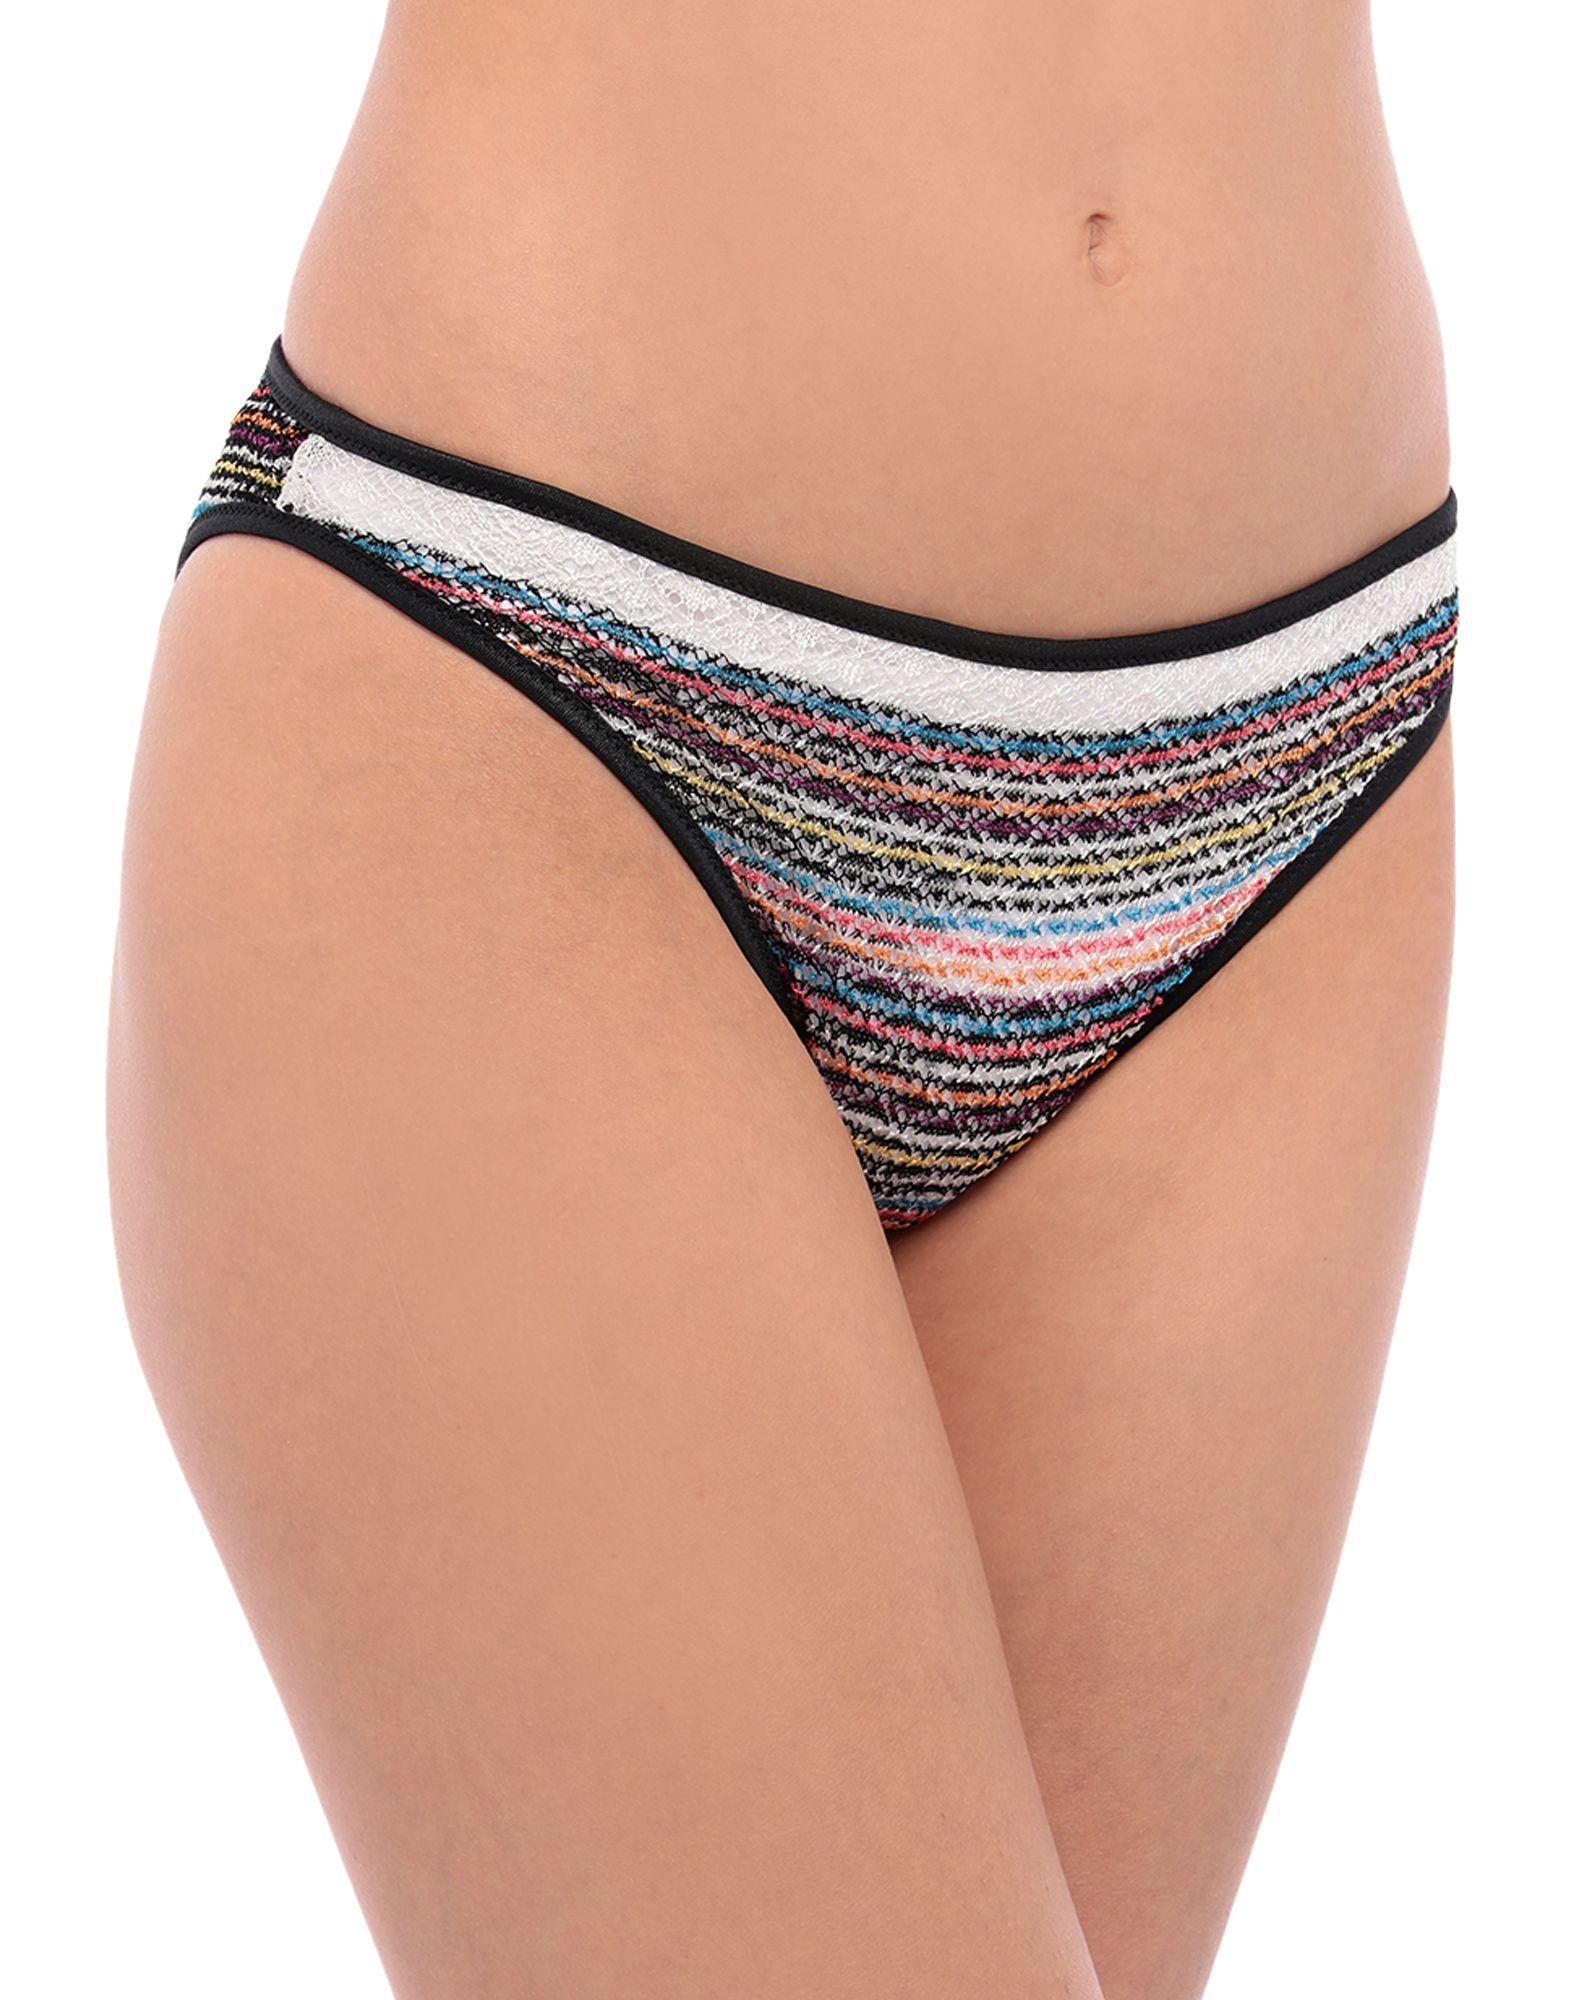 MISSONI MARE Bikini bottoms - Item 47258995